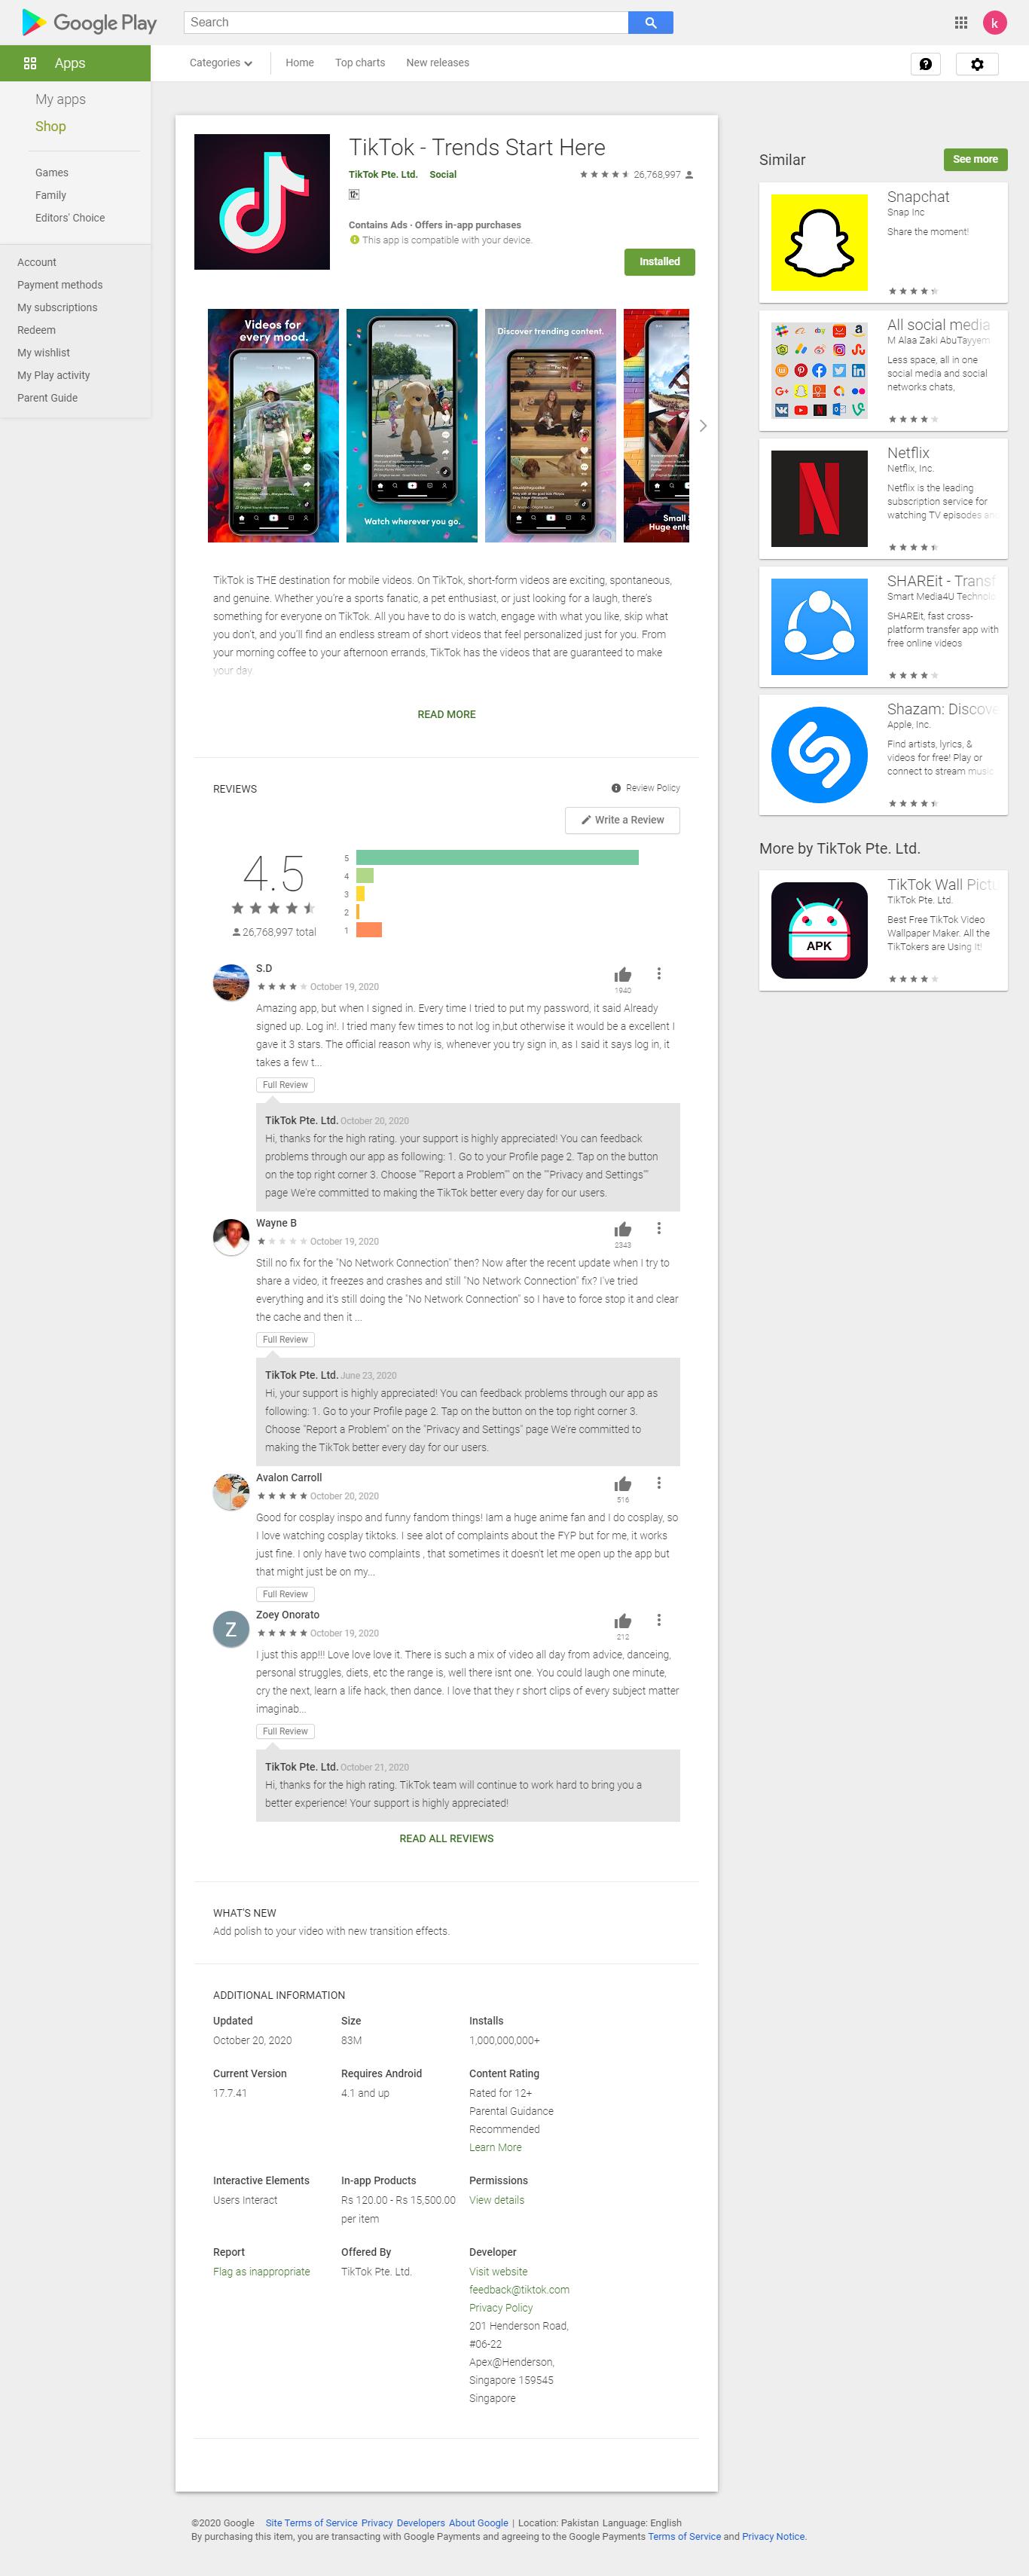 Tiktok App Following Latest Designing Trend For Next Level Project Mobile App Latest Design Trends App